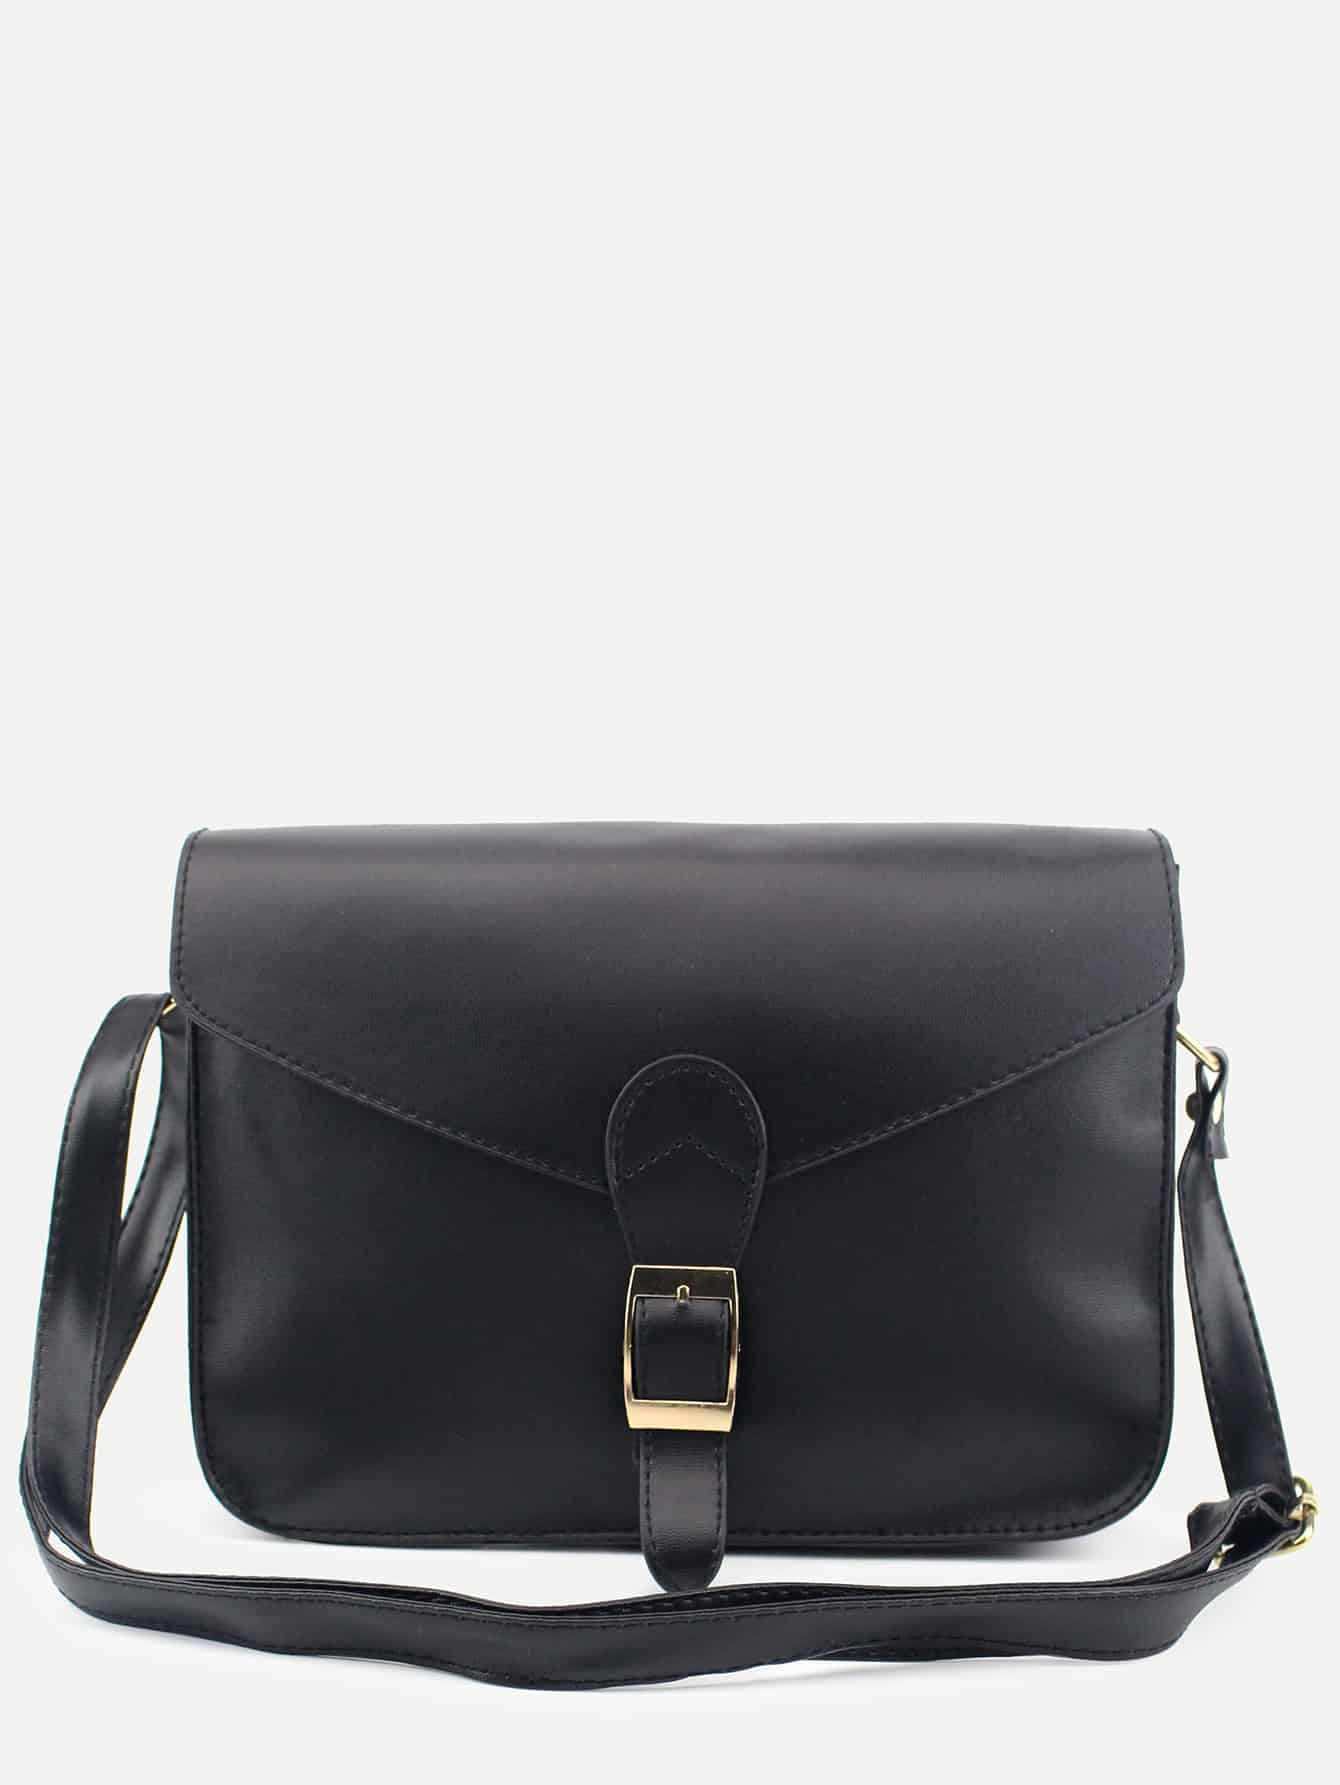 Black Buckle Strap Closure Envelope Crossbody Bag